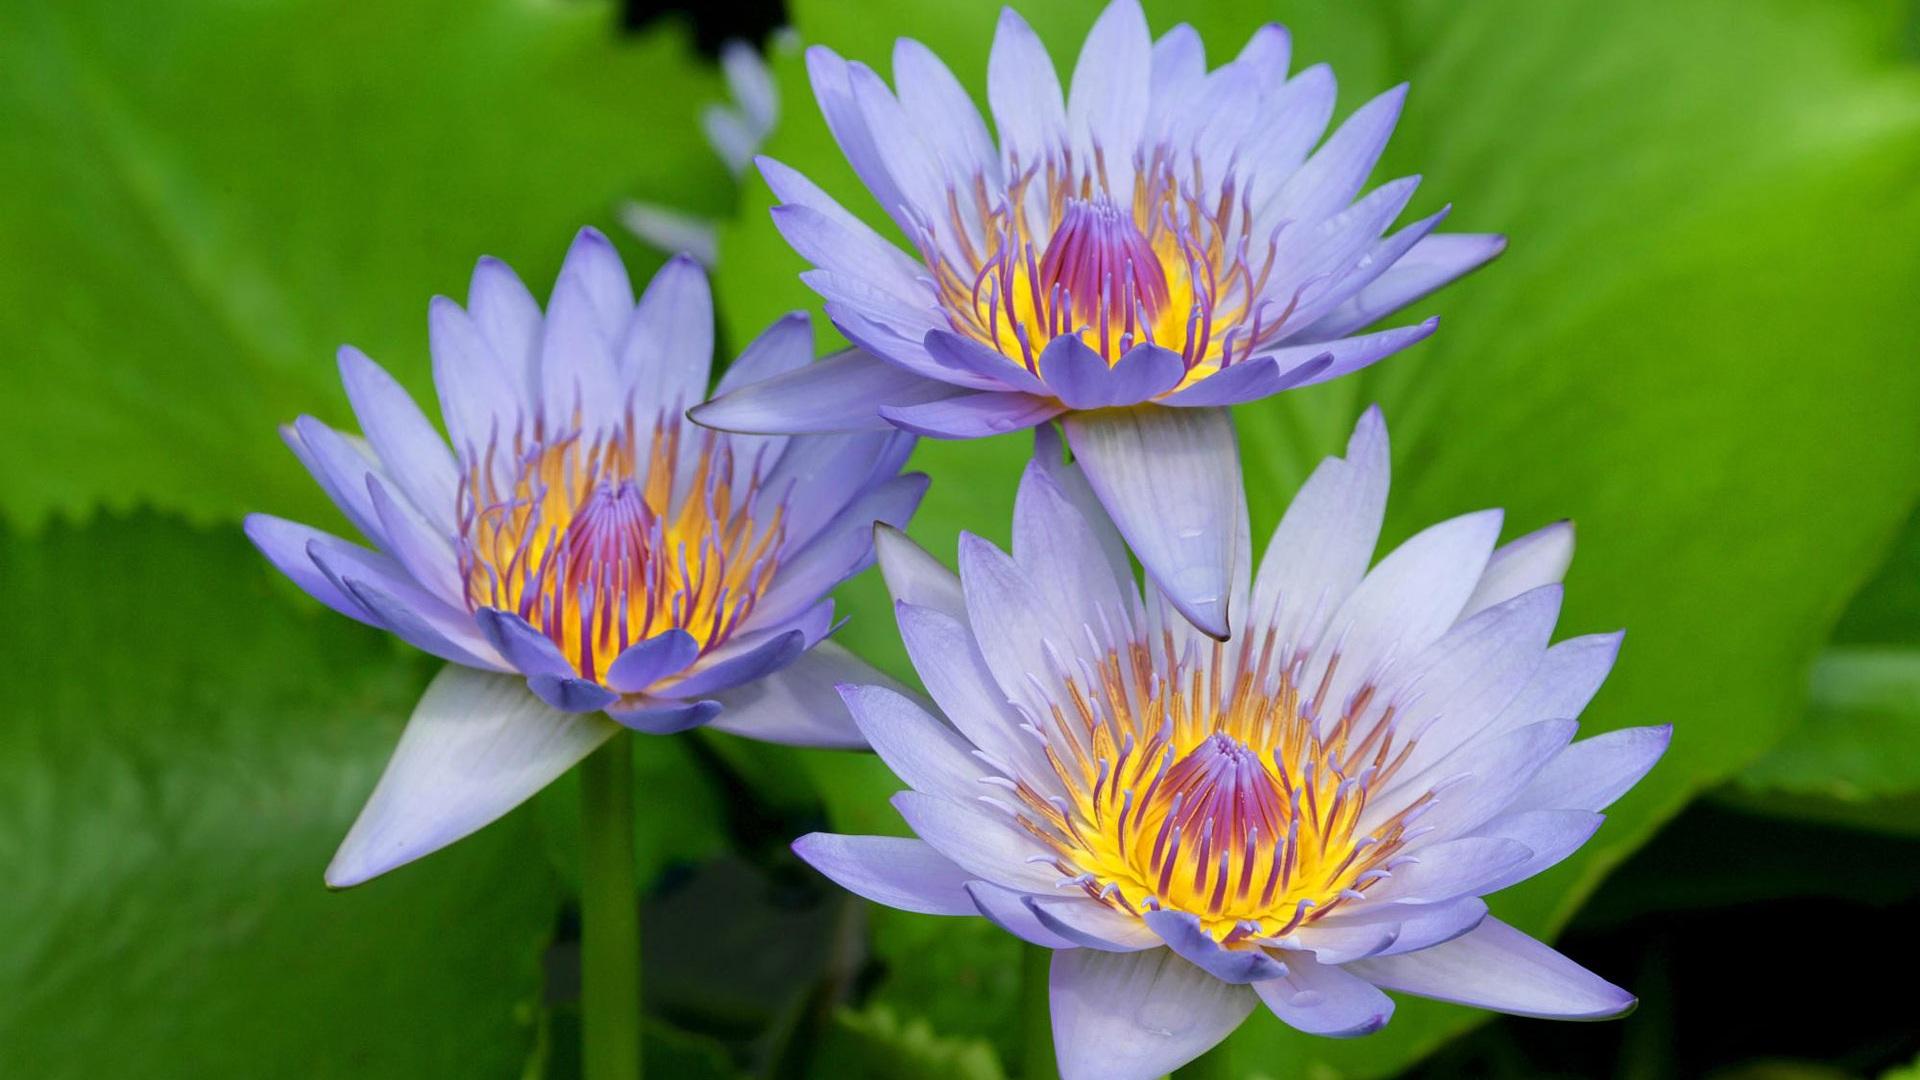 Lotus Bleu Fonds D Cran Description Trois Lotus Bleu